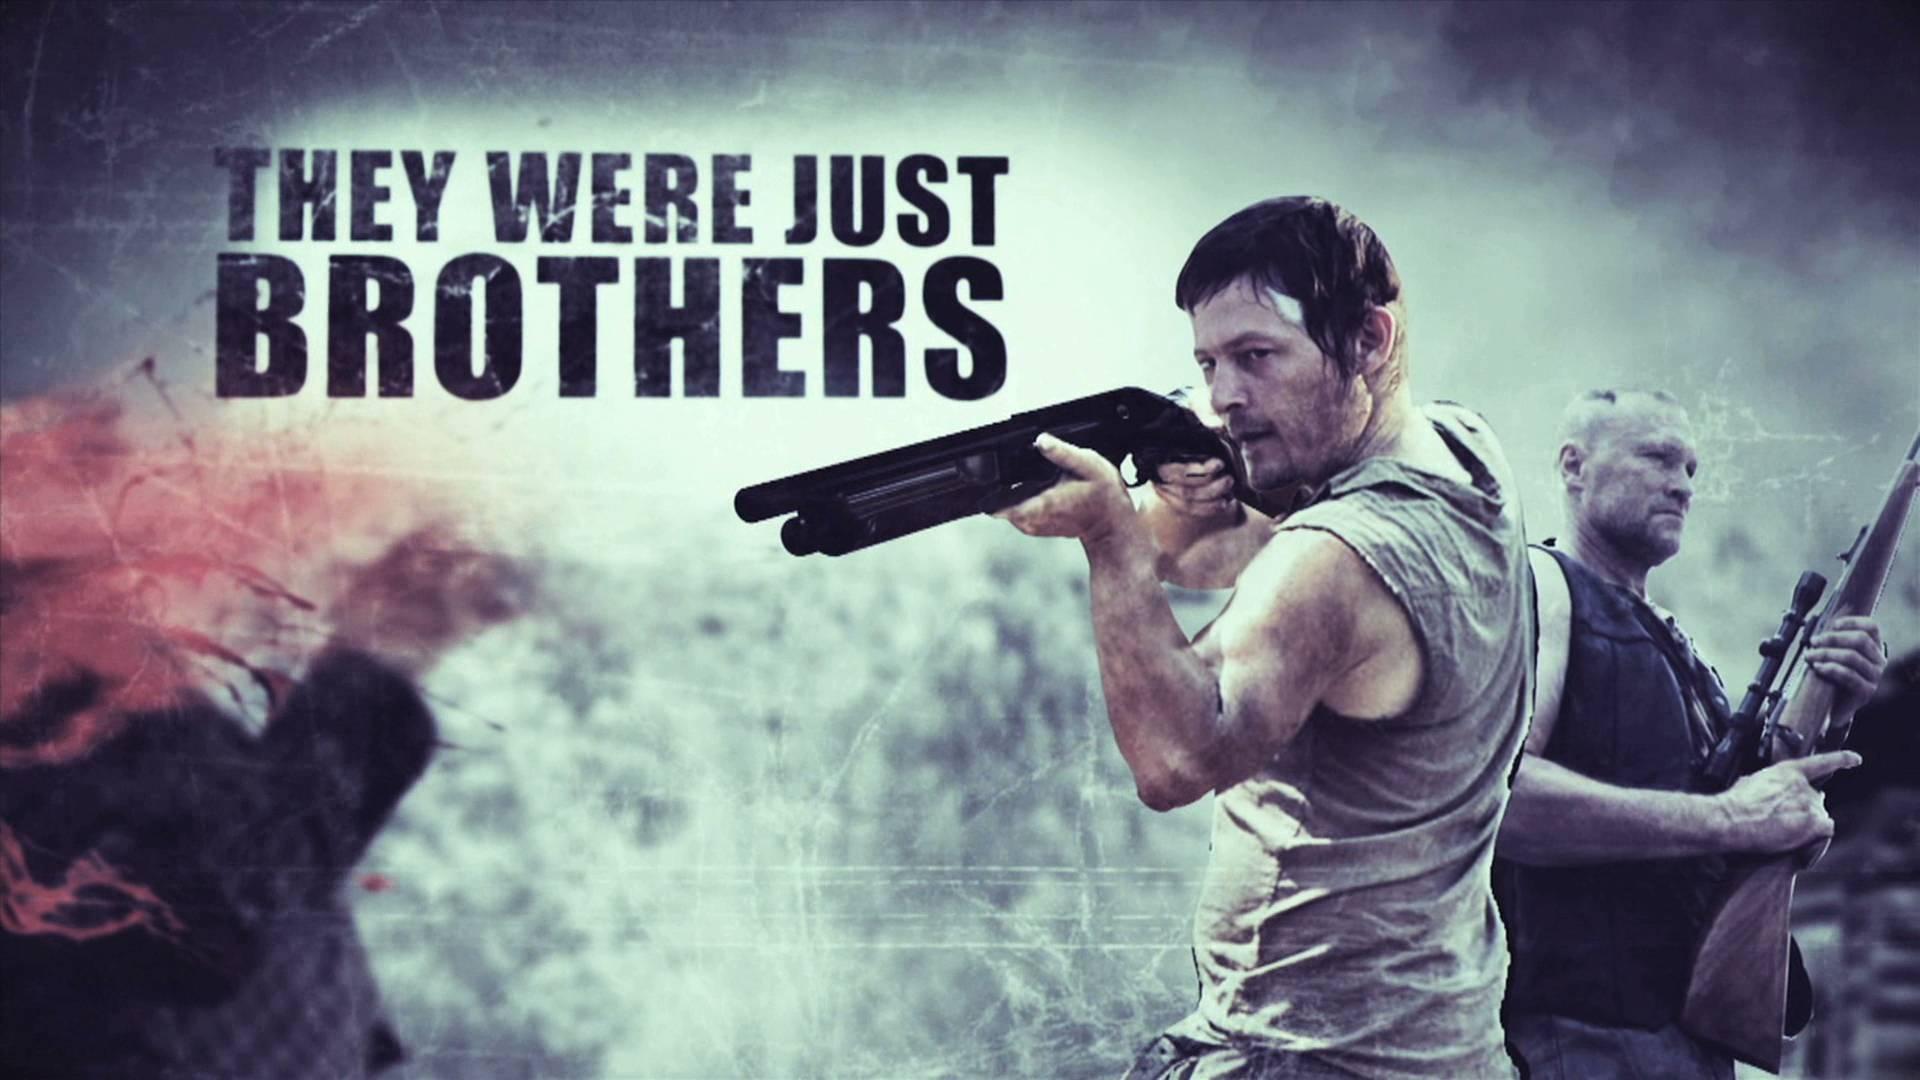 Walking Dead Survival Instinct Hd Wallpapers 171 Gamingbolt Com Video Game News Reviews